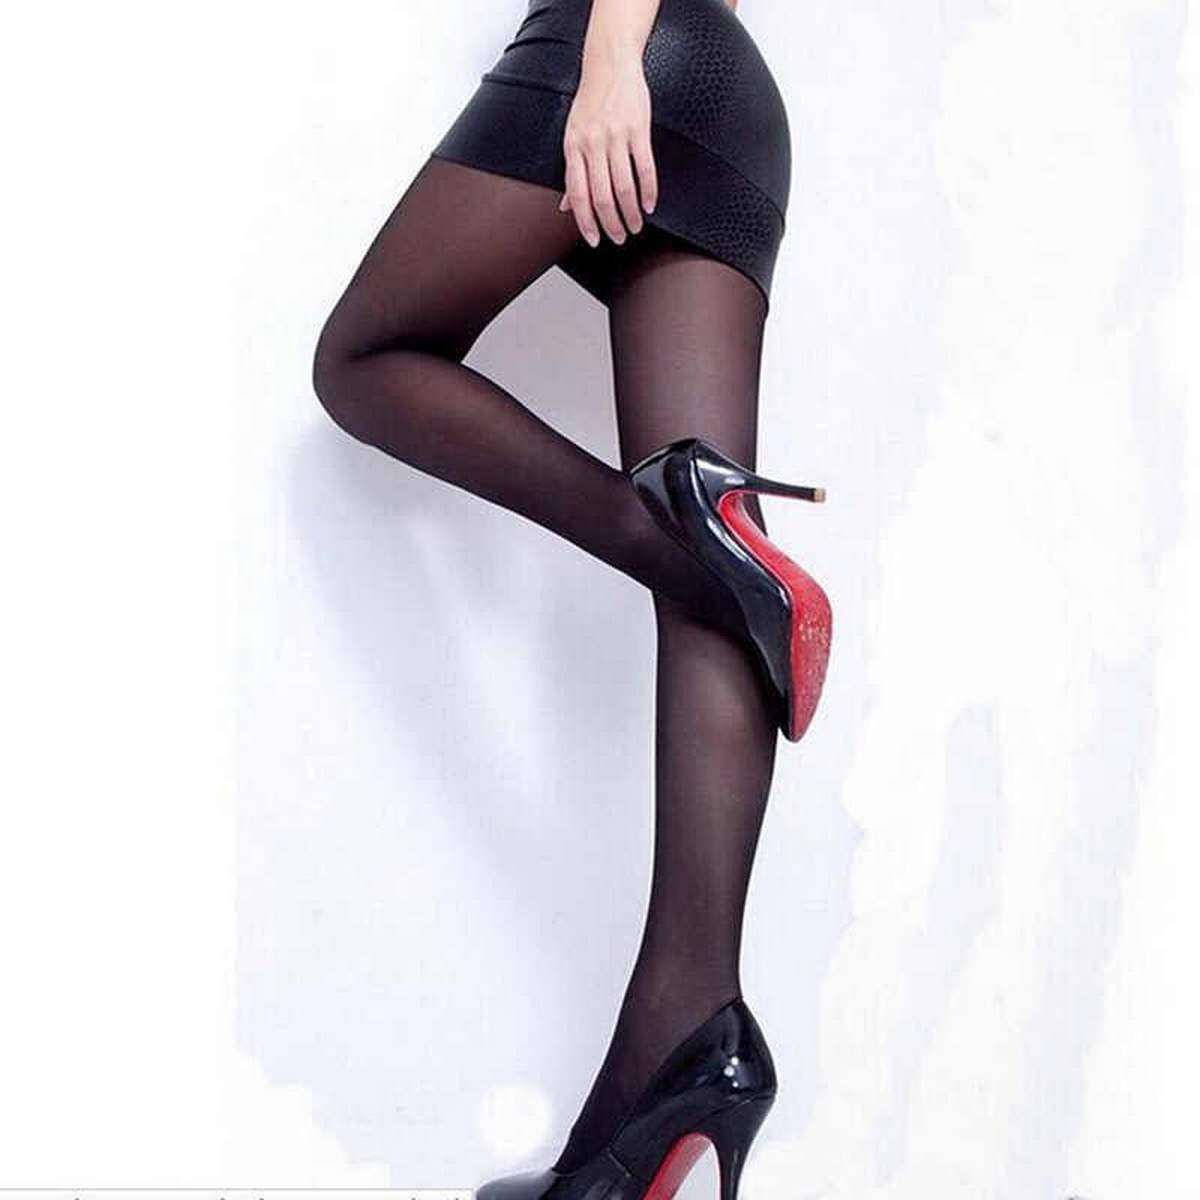 Female Lady Girl Top Thigh High Full Leg Body Stocking Long Tights